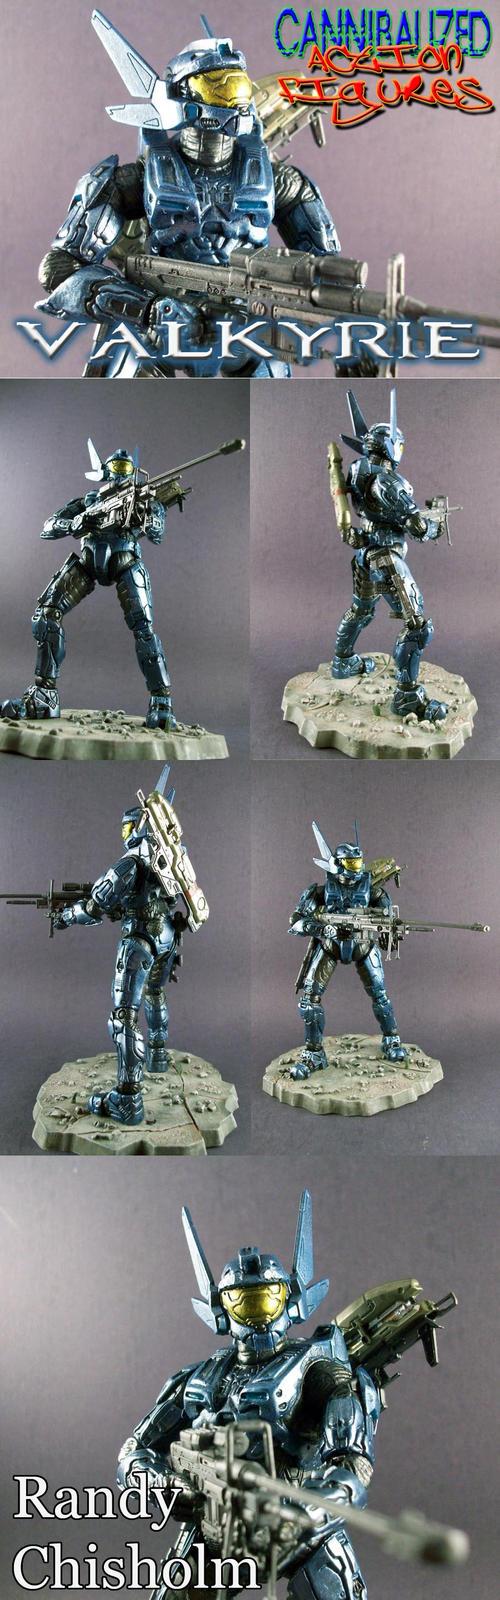 Halo Reach Armor Customizer Custom Halo 3 Valkyrie Armor